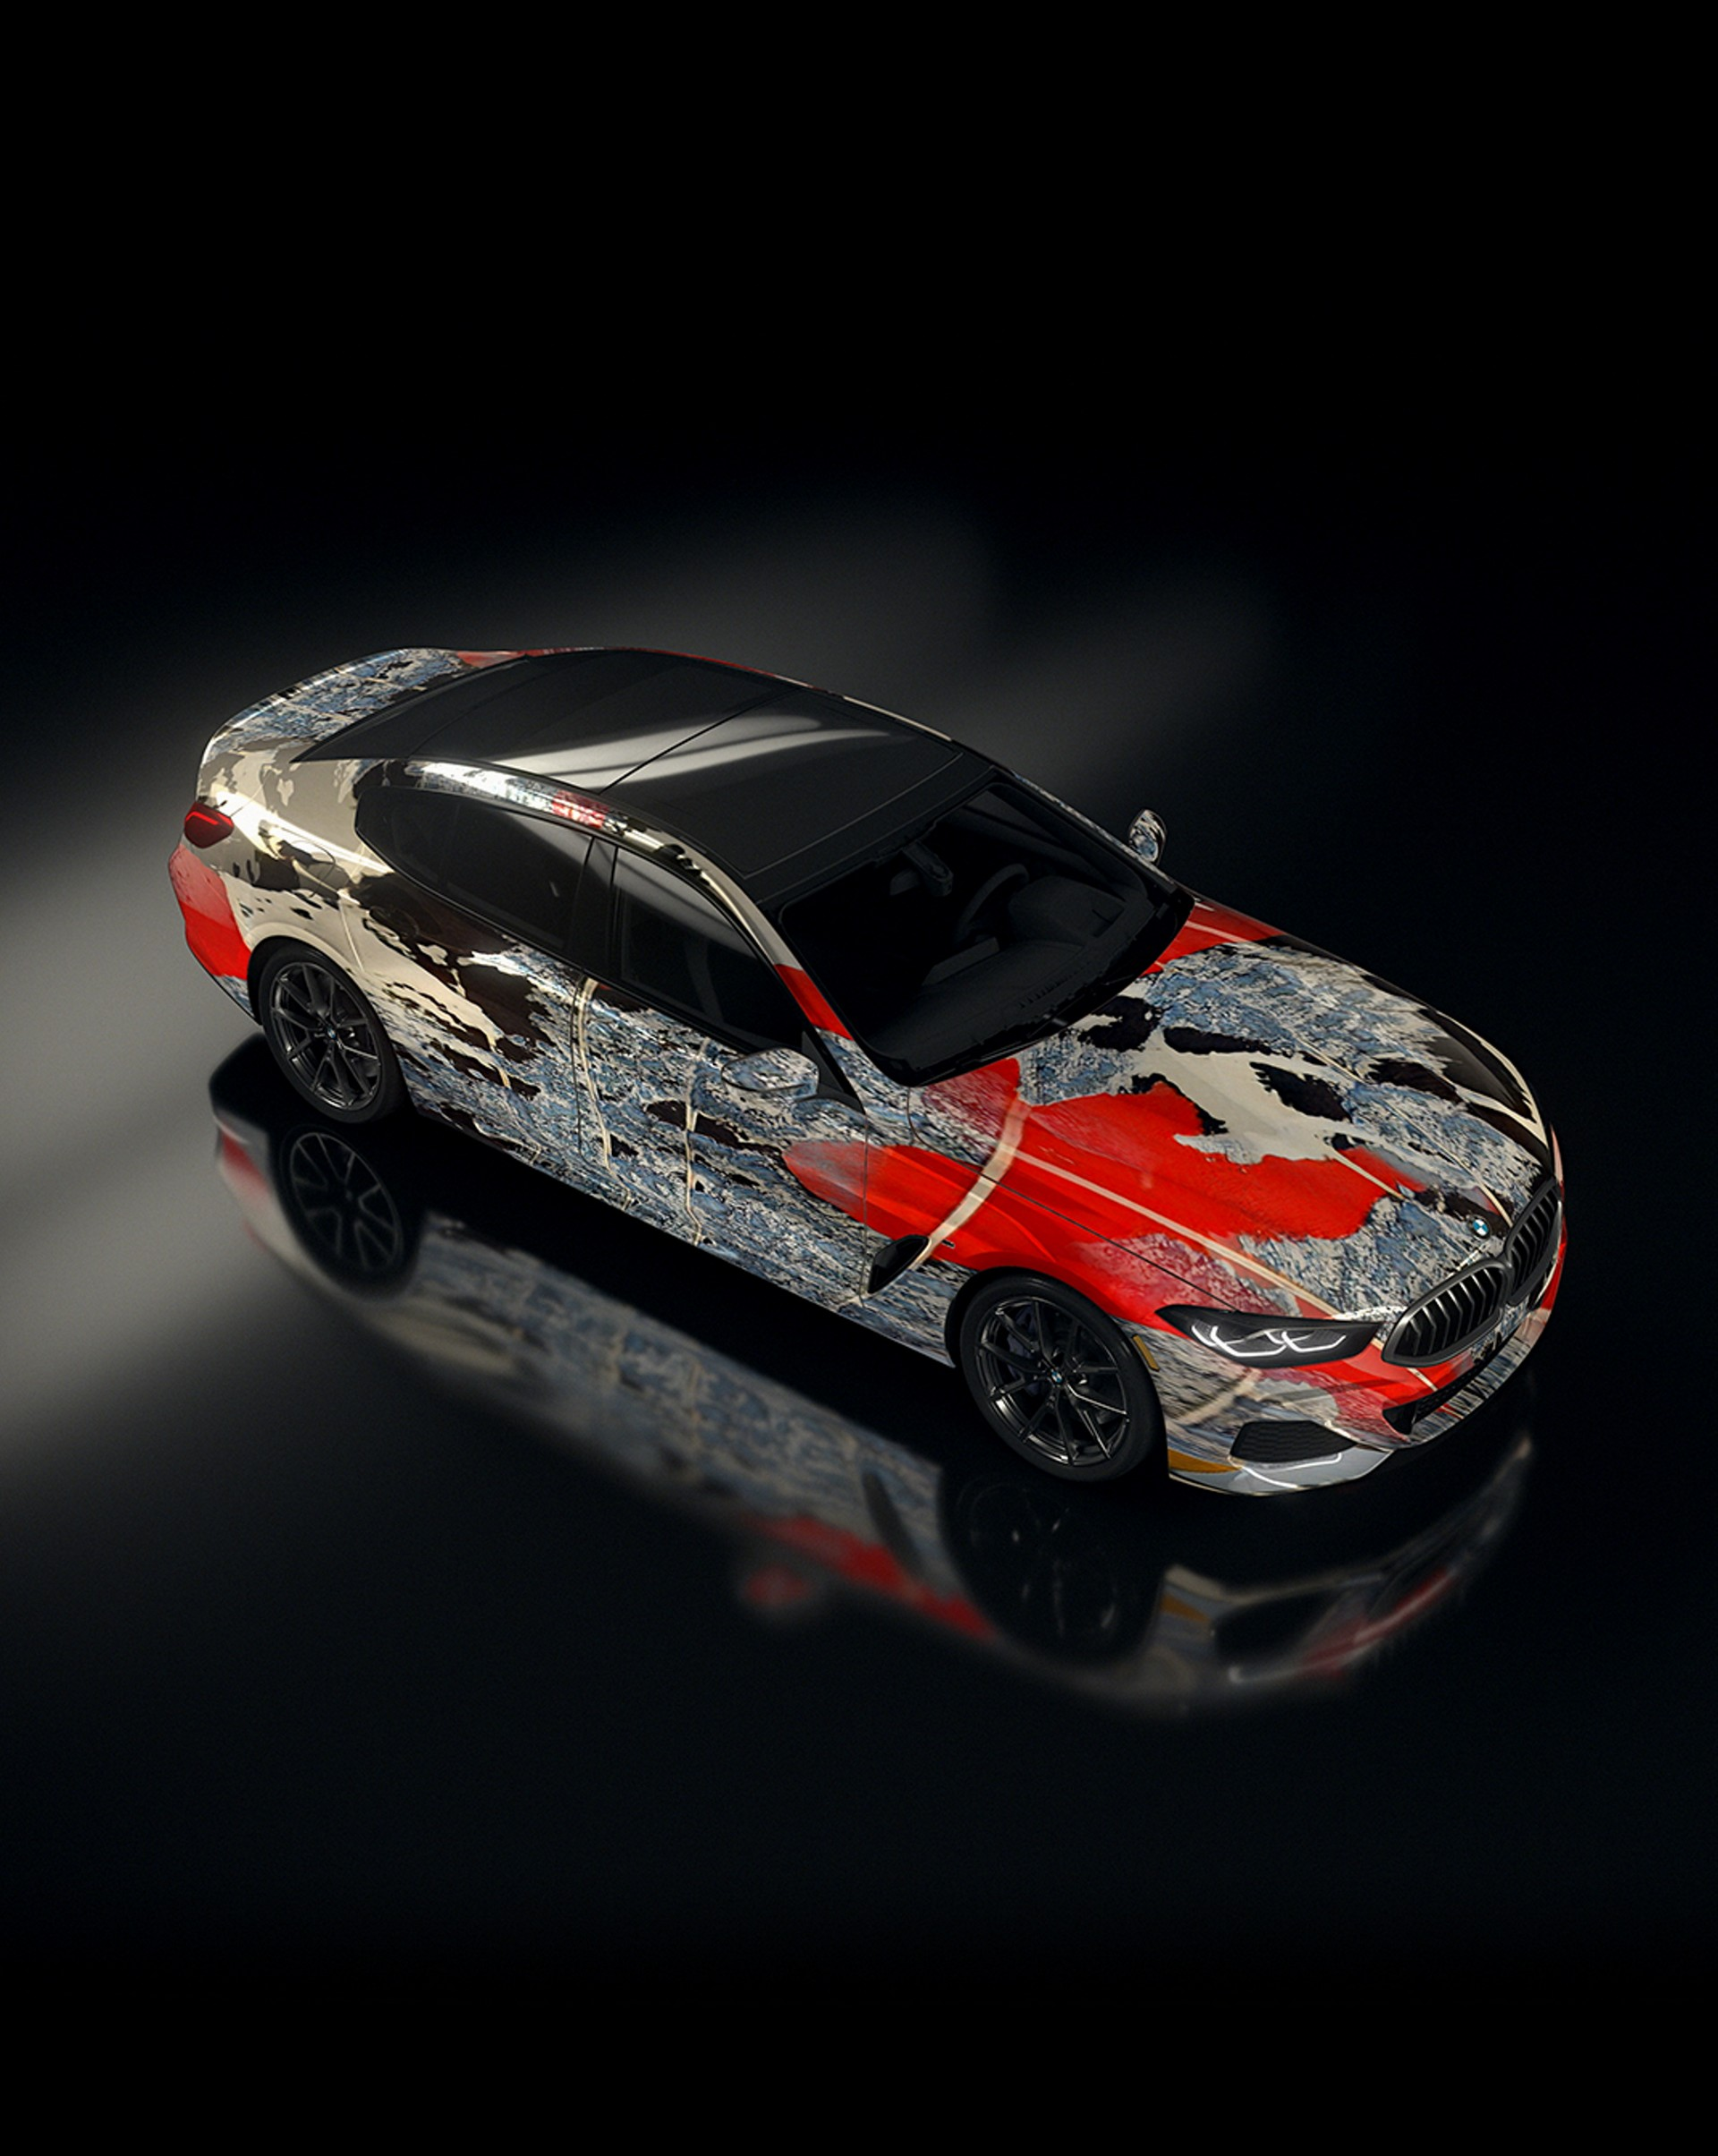 BMW-8-Series-Gran-Coupe-art-car-21